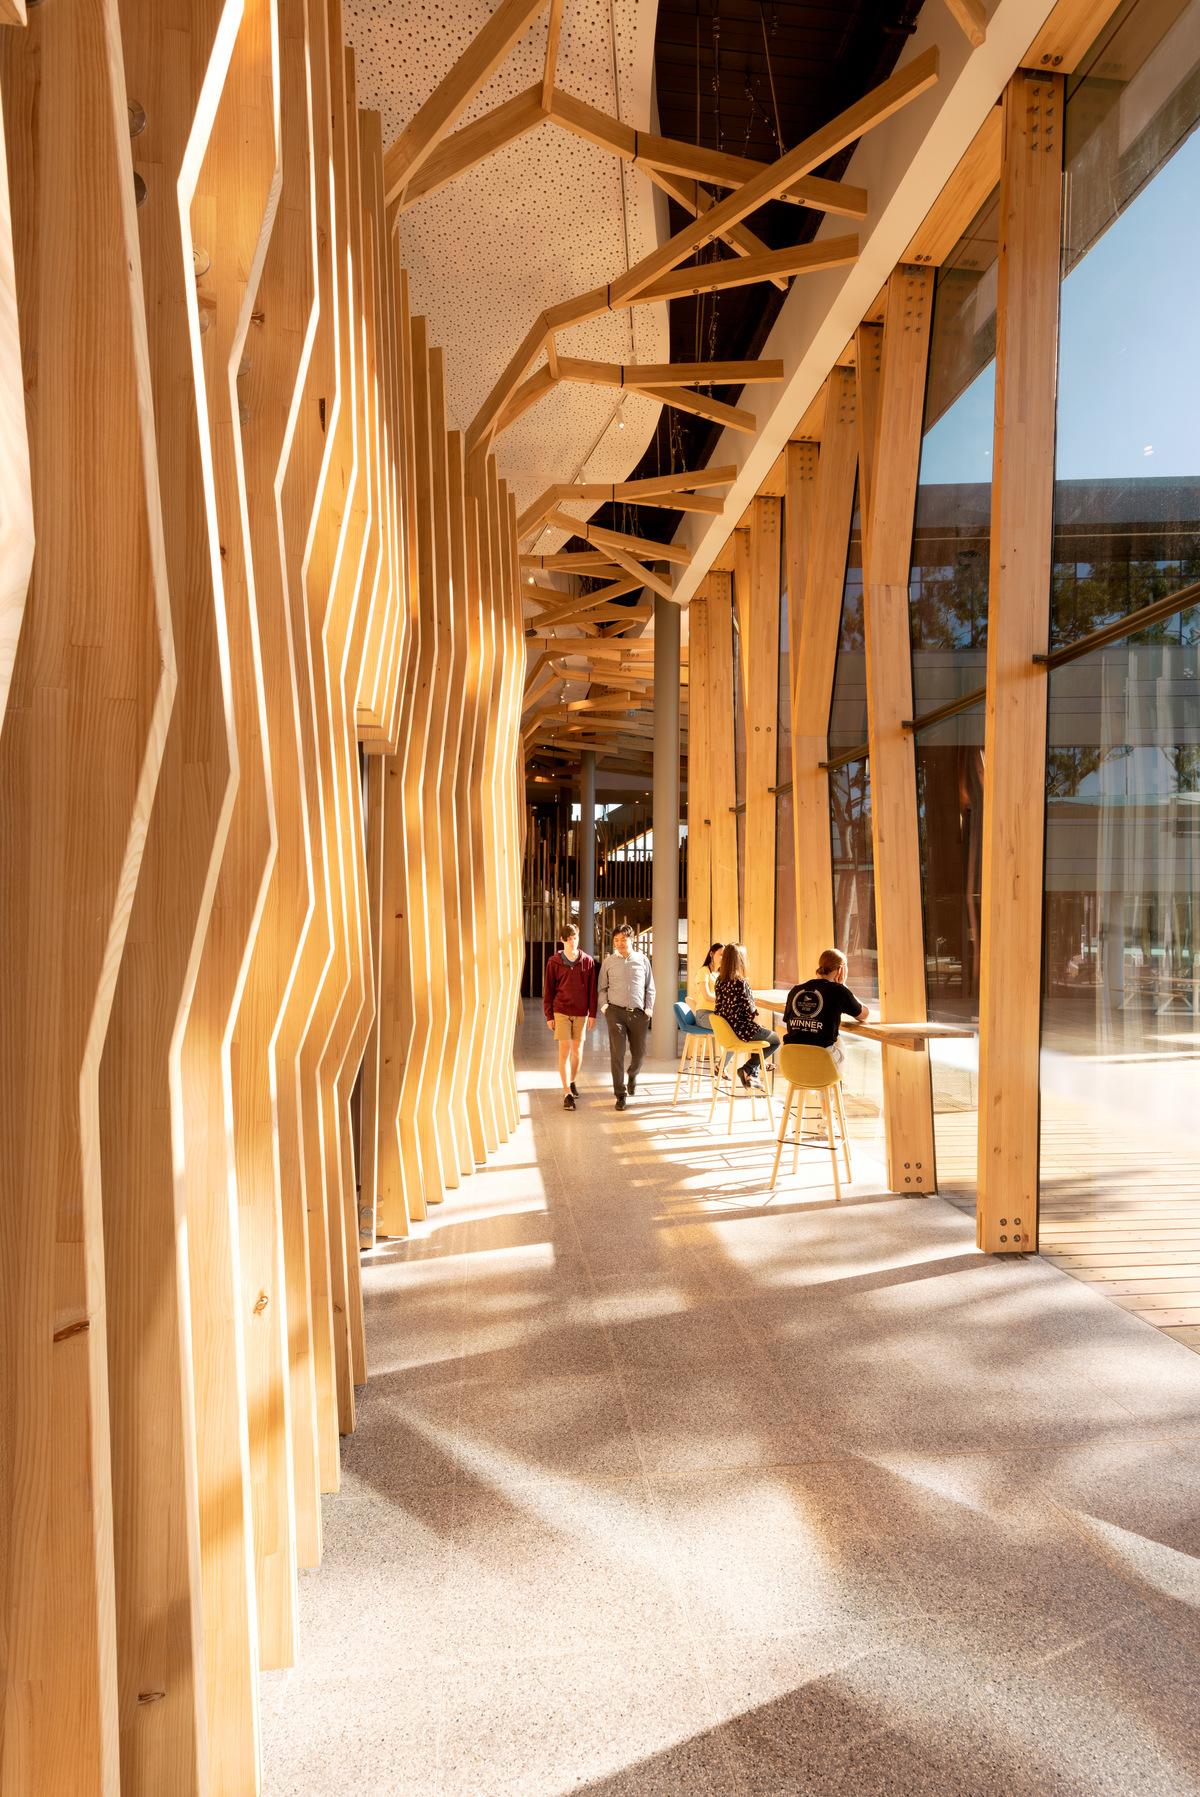 The Orygen and OYH Parkville building designed by Billard Leece Partnership (BLP)